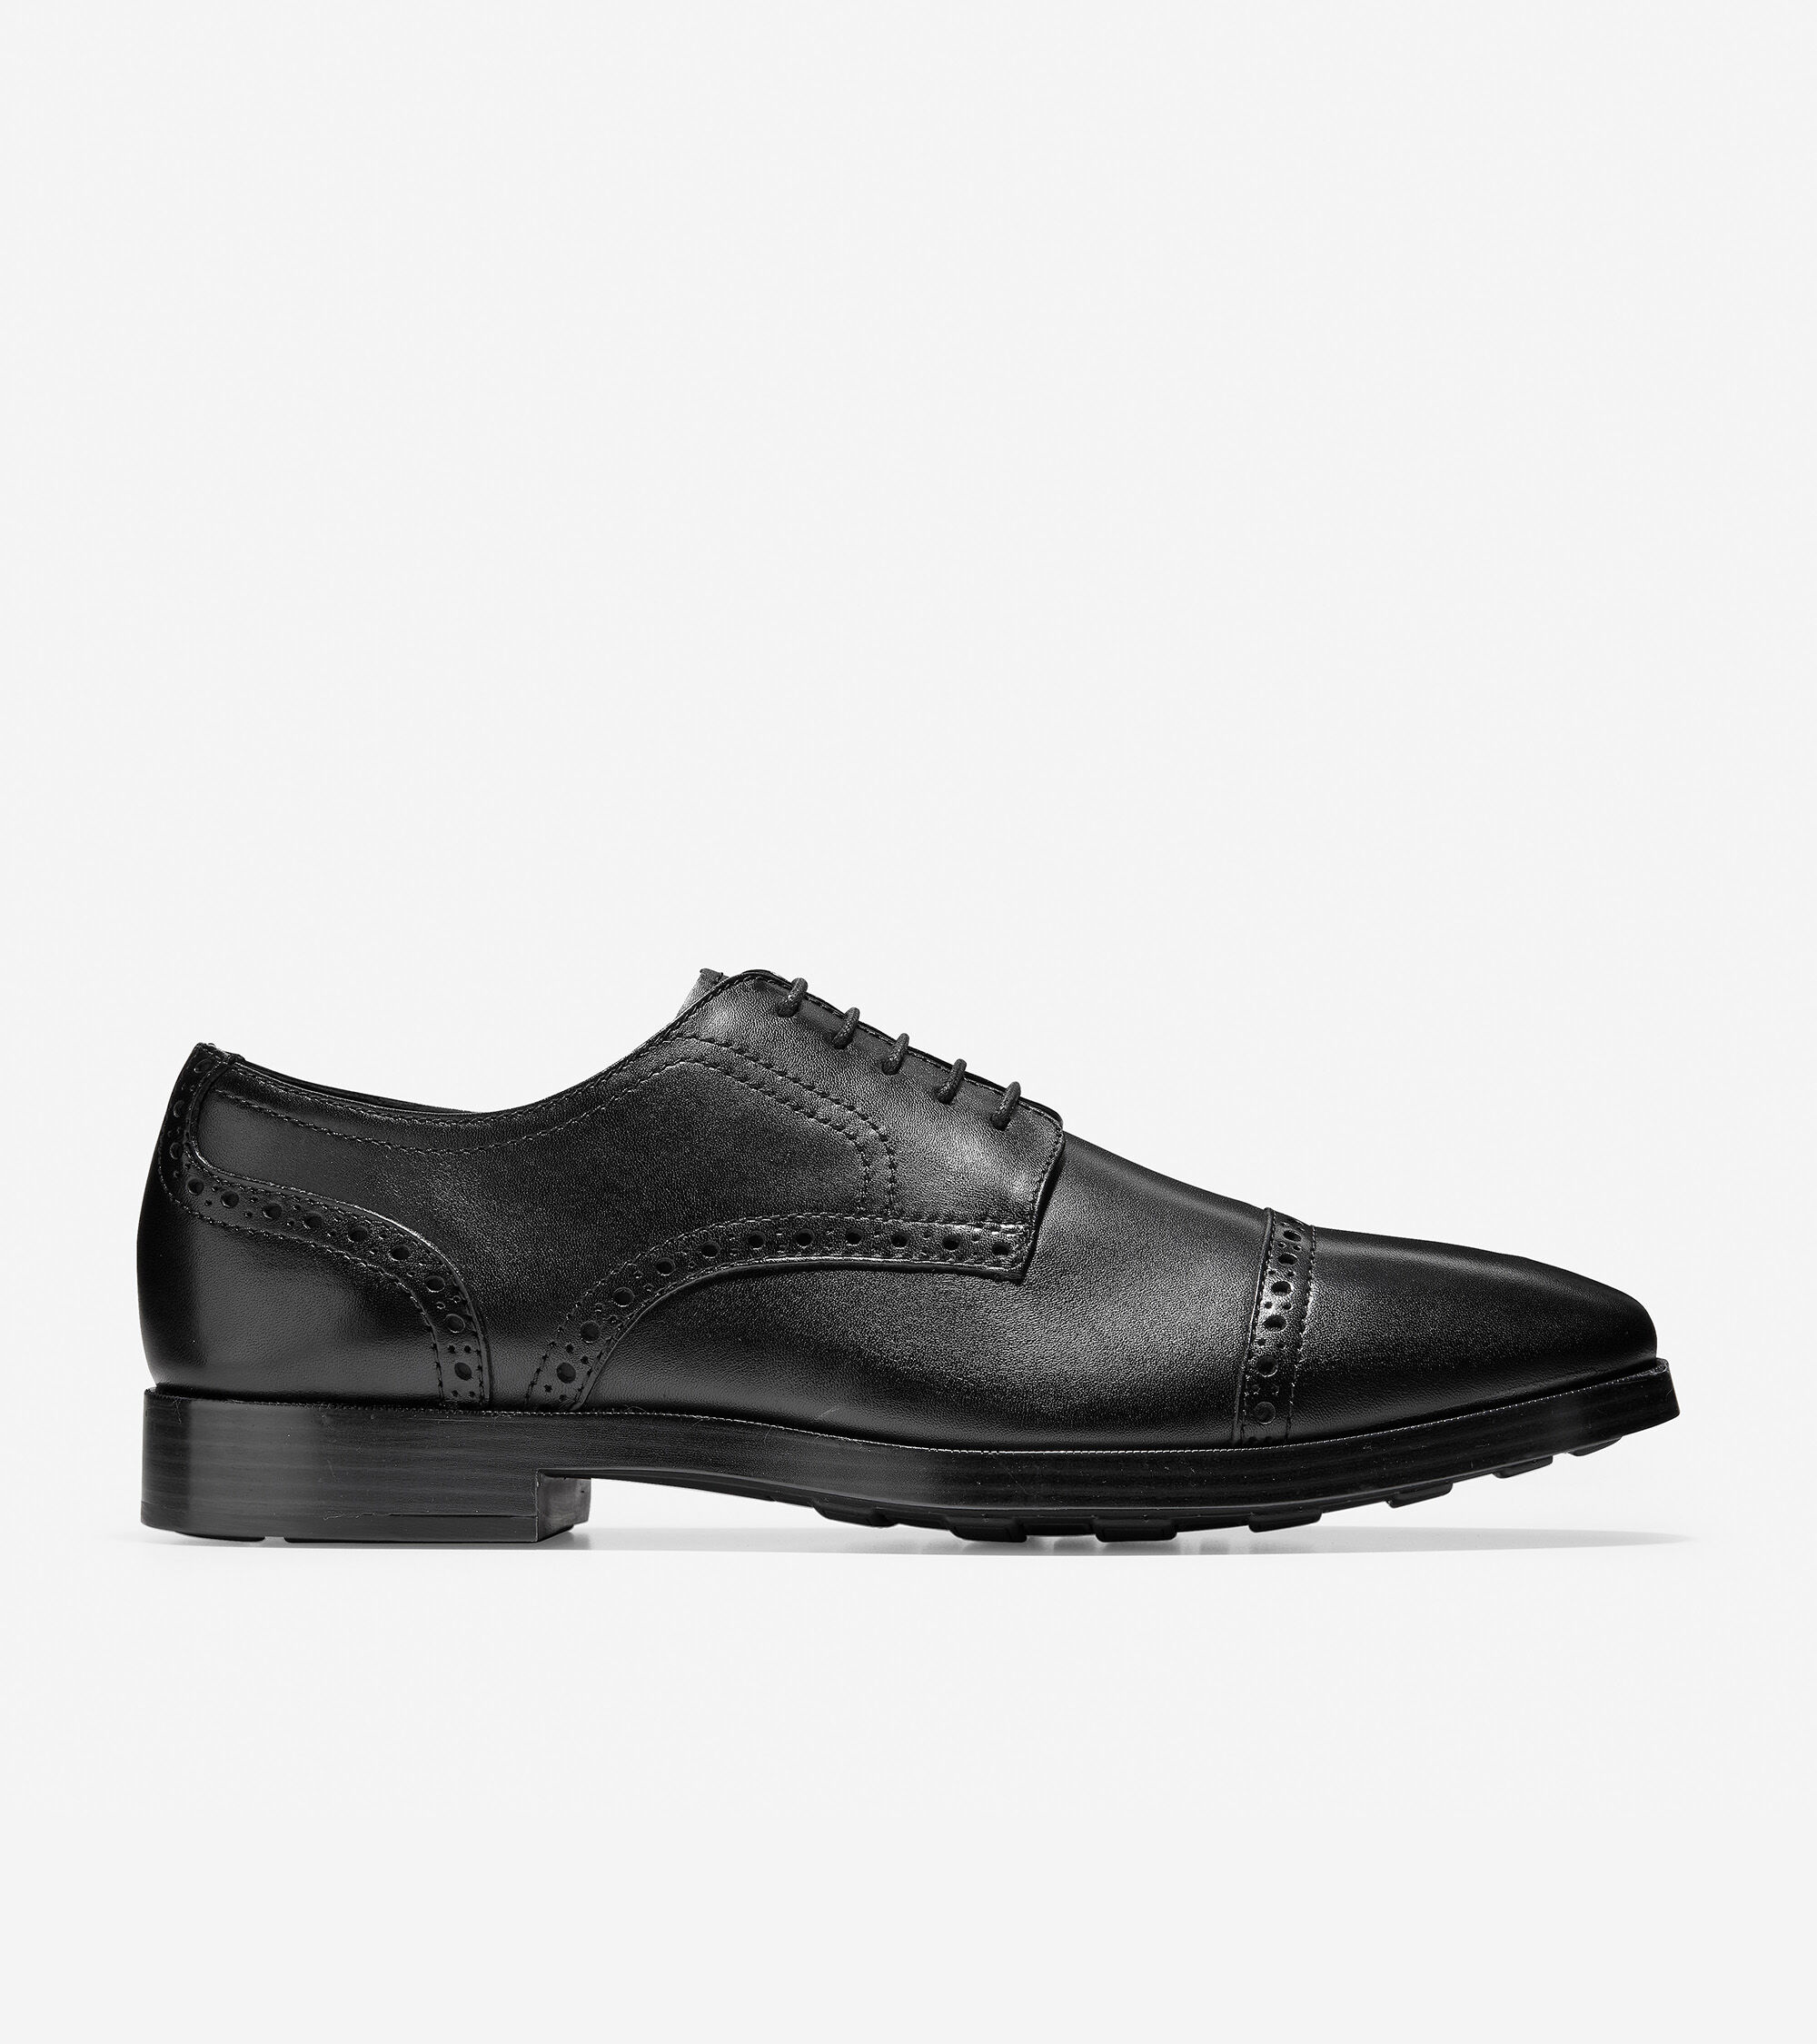 Cole Haan Jefferson Grand Cap Toe Oxford Shoes